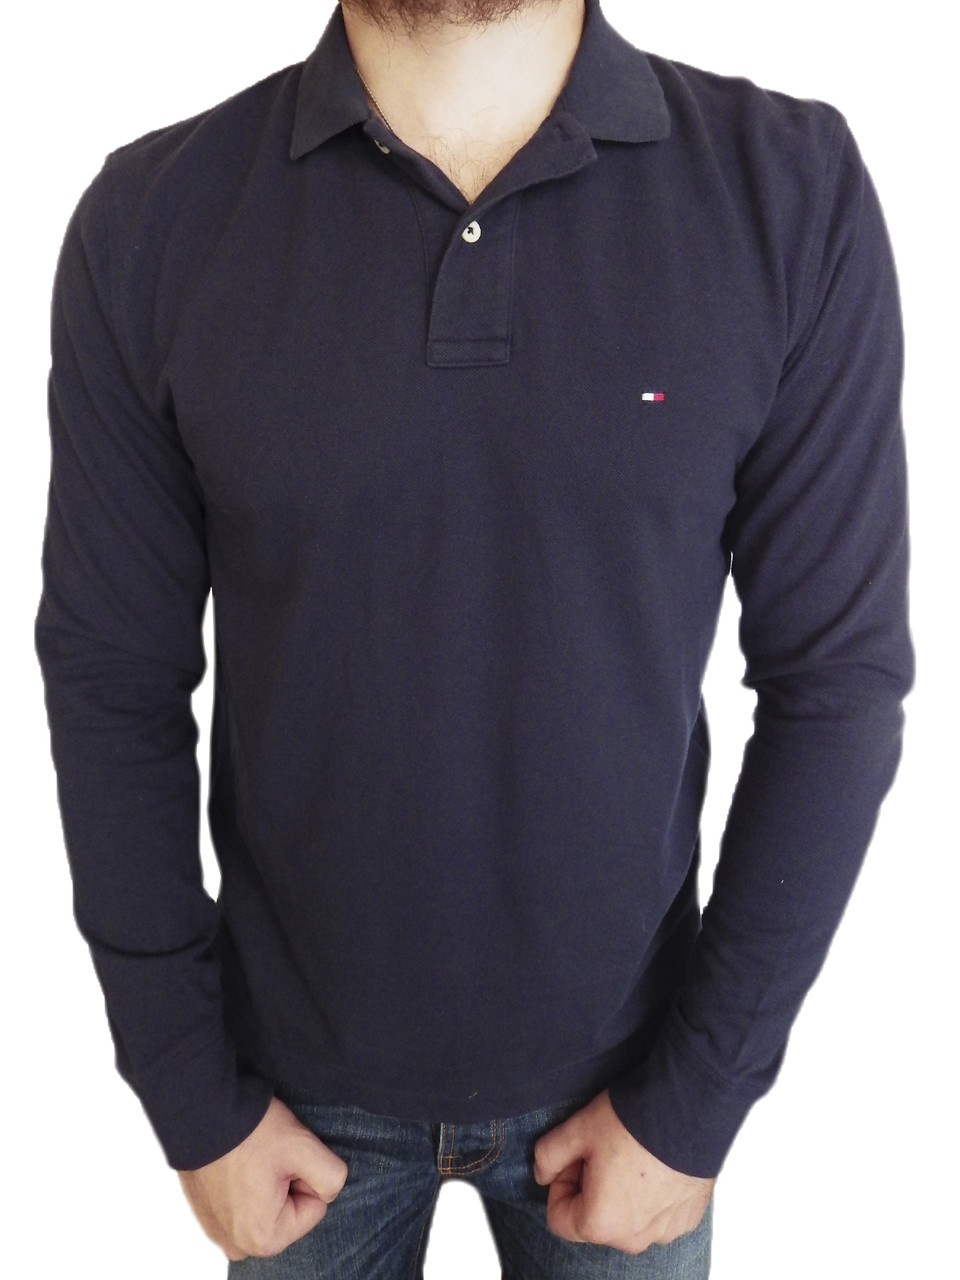 Лонгслив Tommy Hilfiger р-р M Оригинал (сток, б/у) мужской свитер кофта original